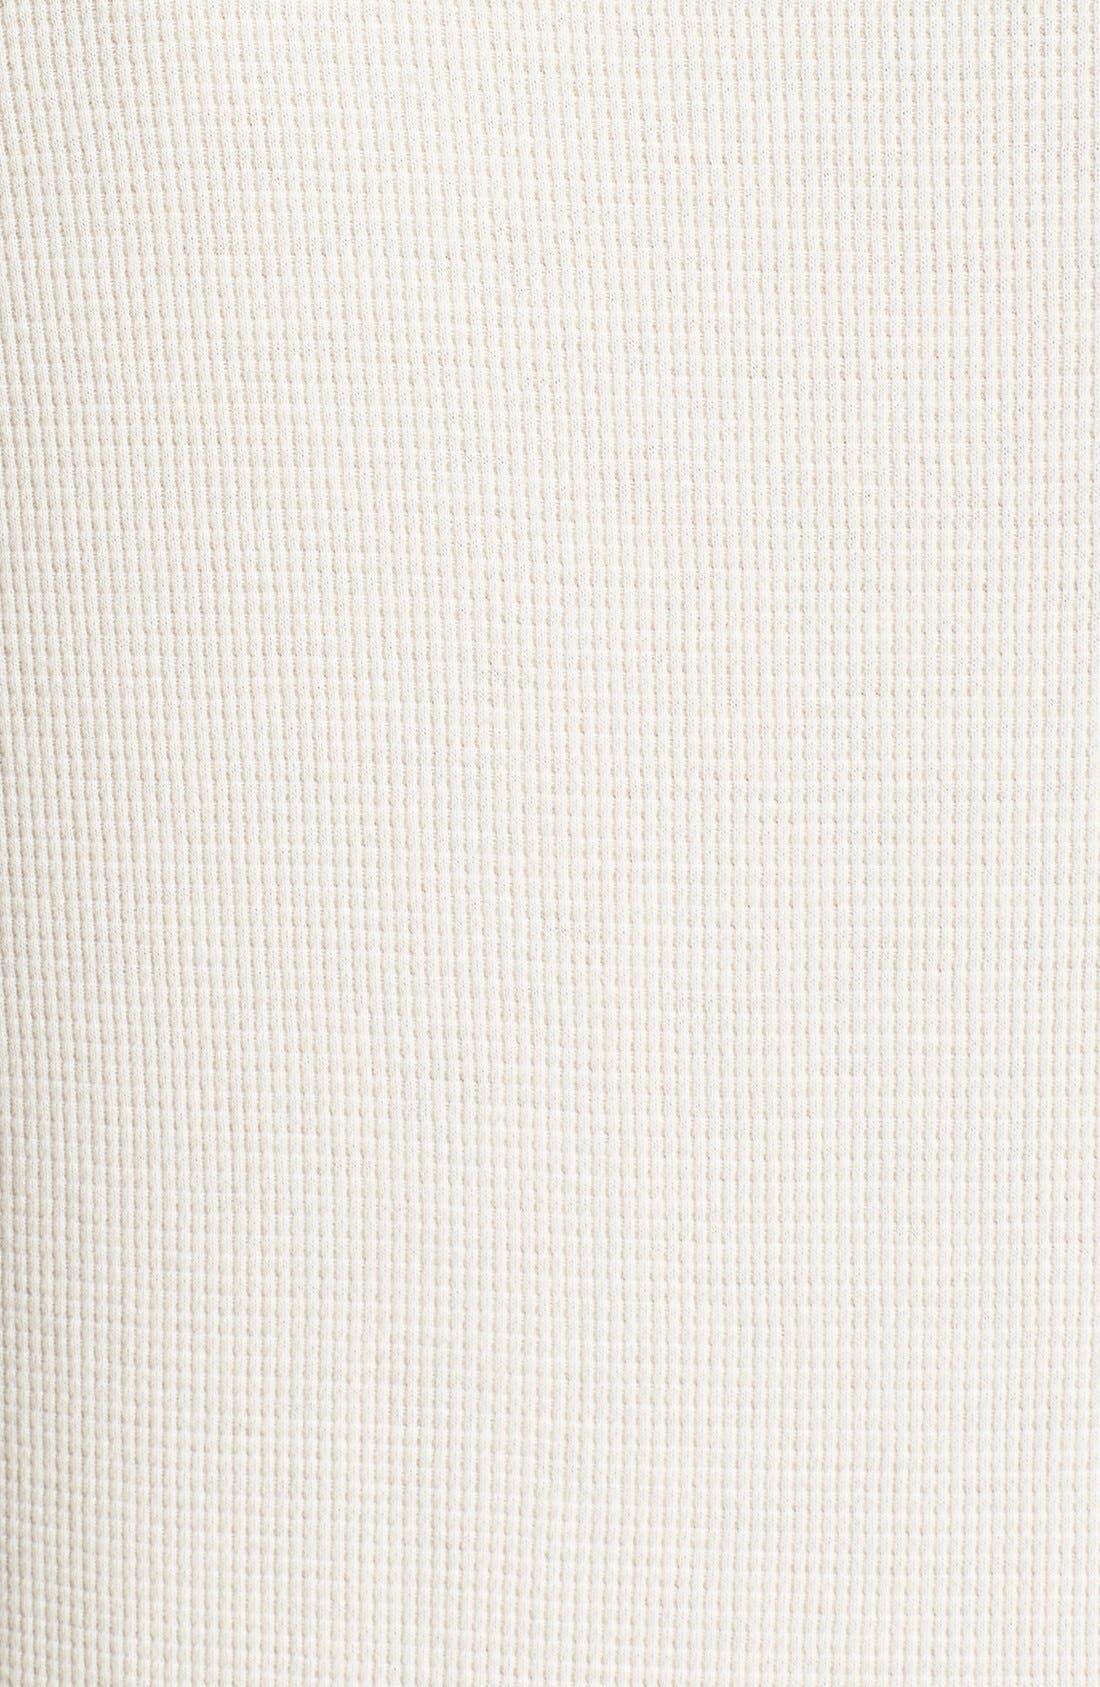 Alternate Image 3  - Polo Ralph Lauren Waffle Knit Lounge Shirt